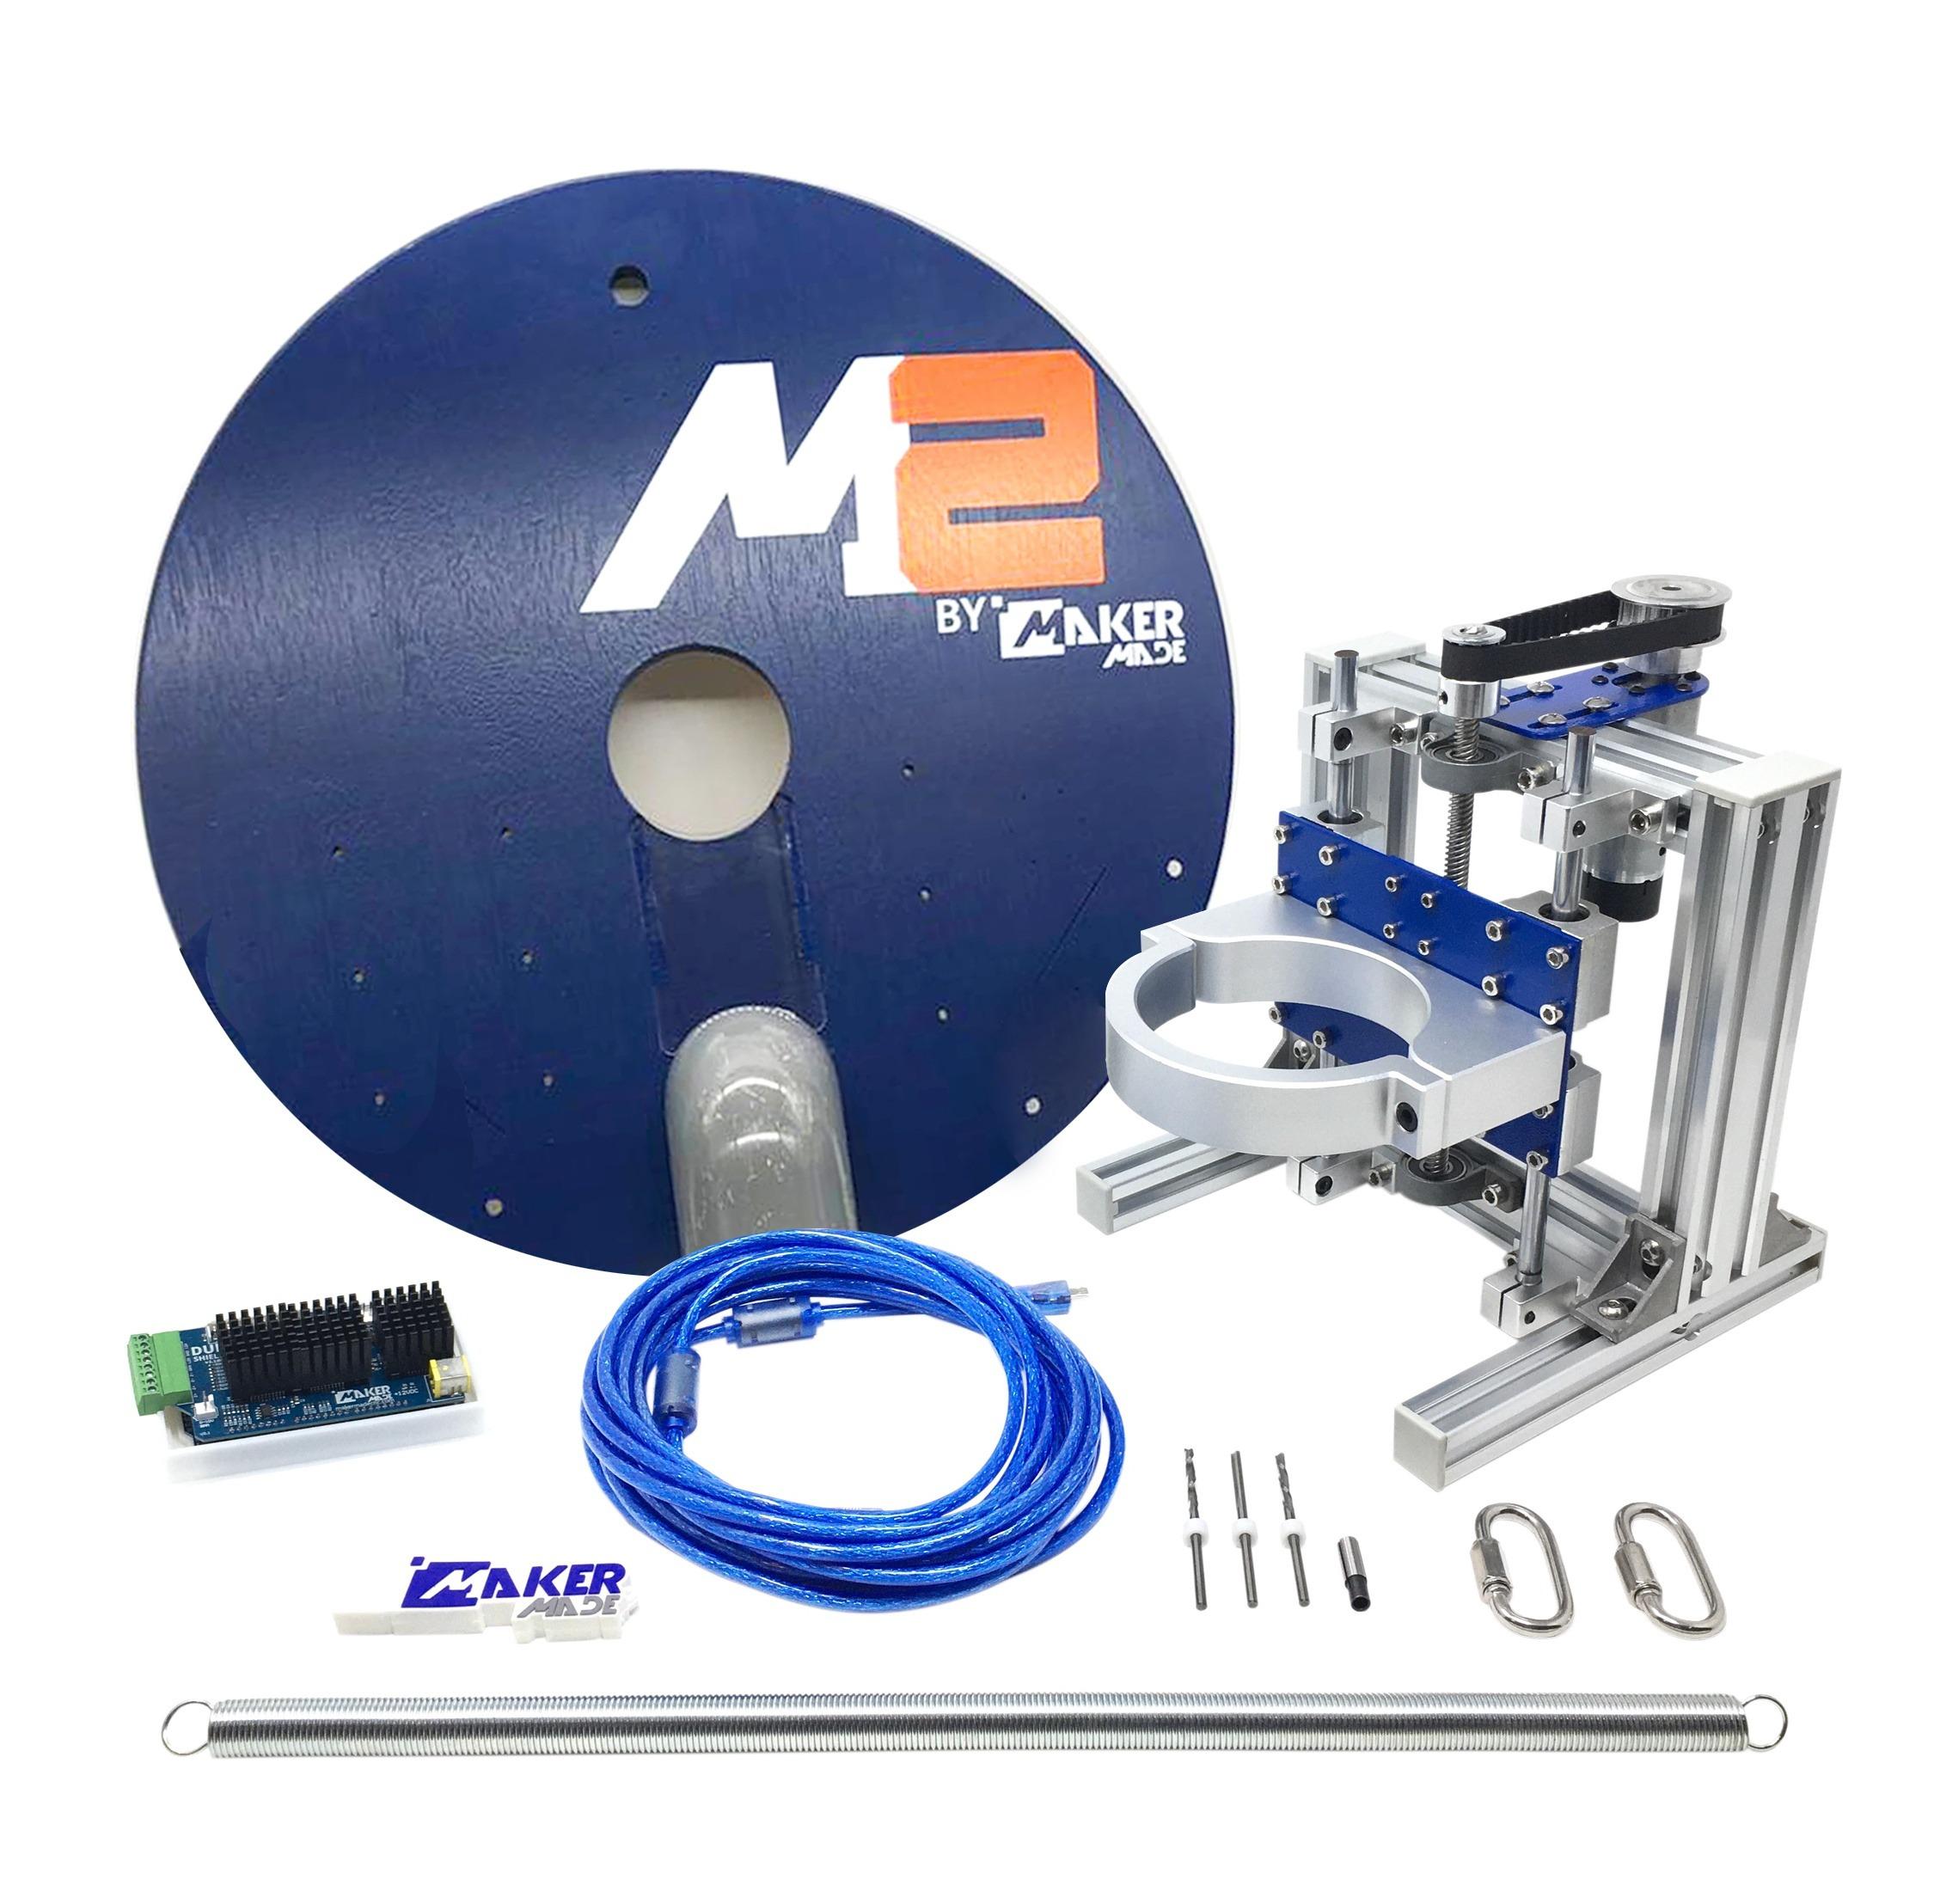 Maker Made M2 Upgrade Kit